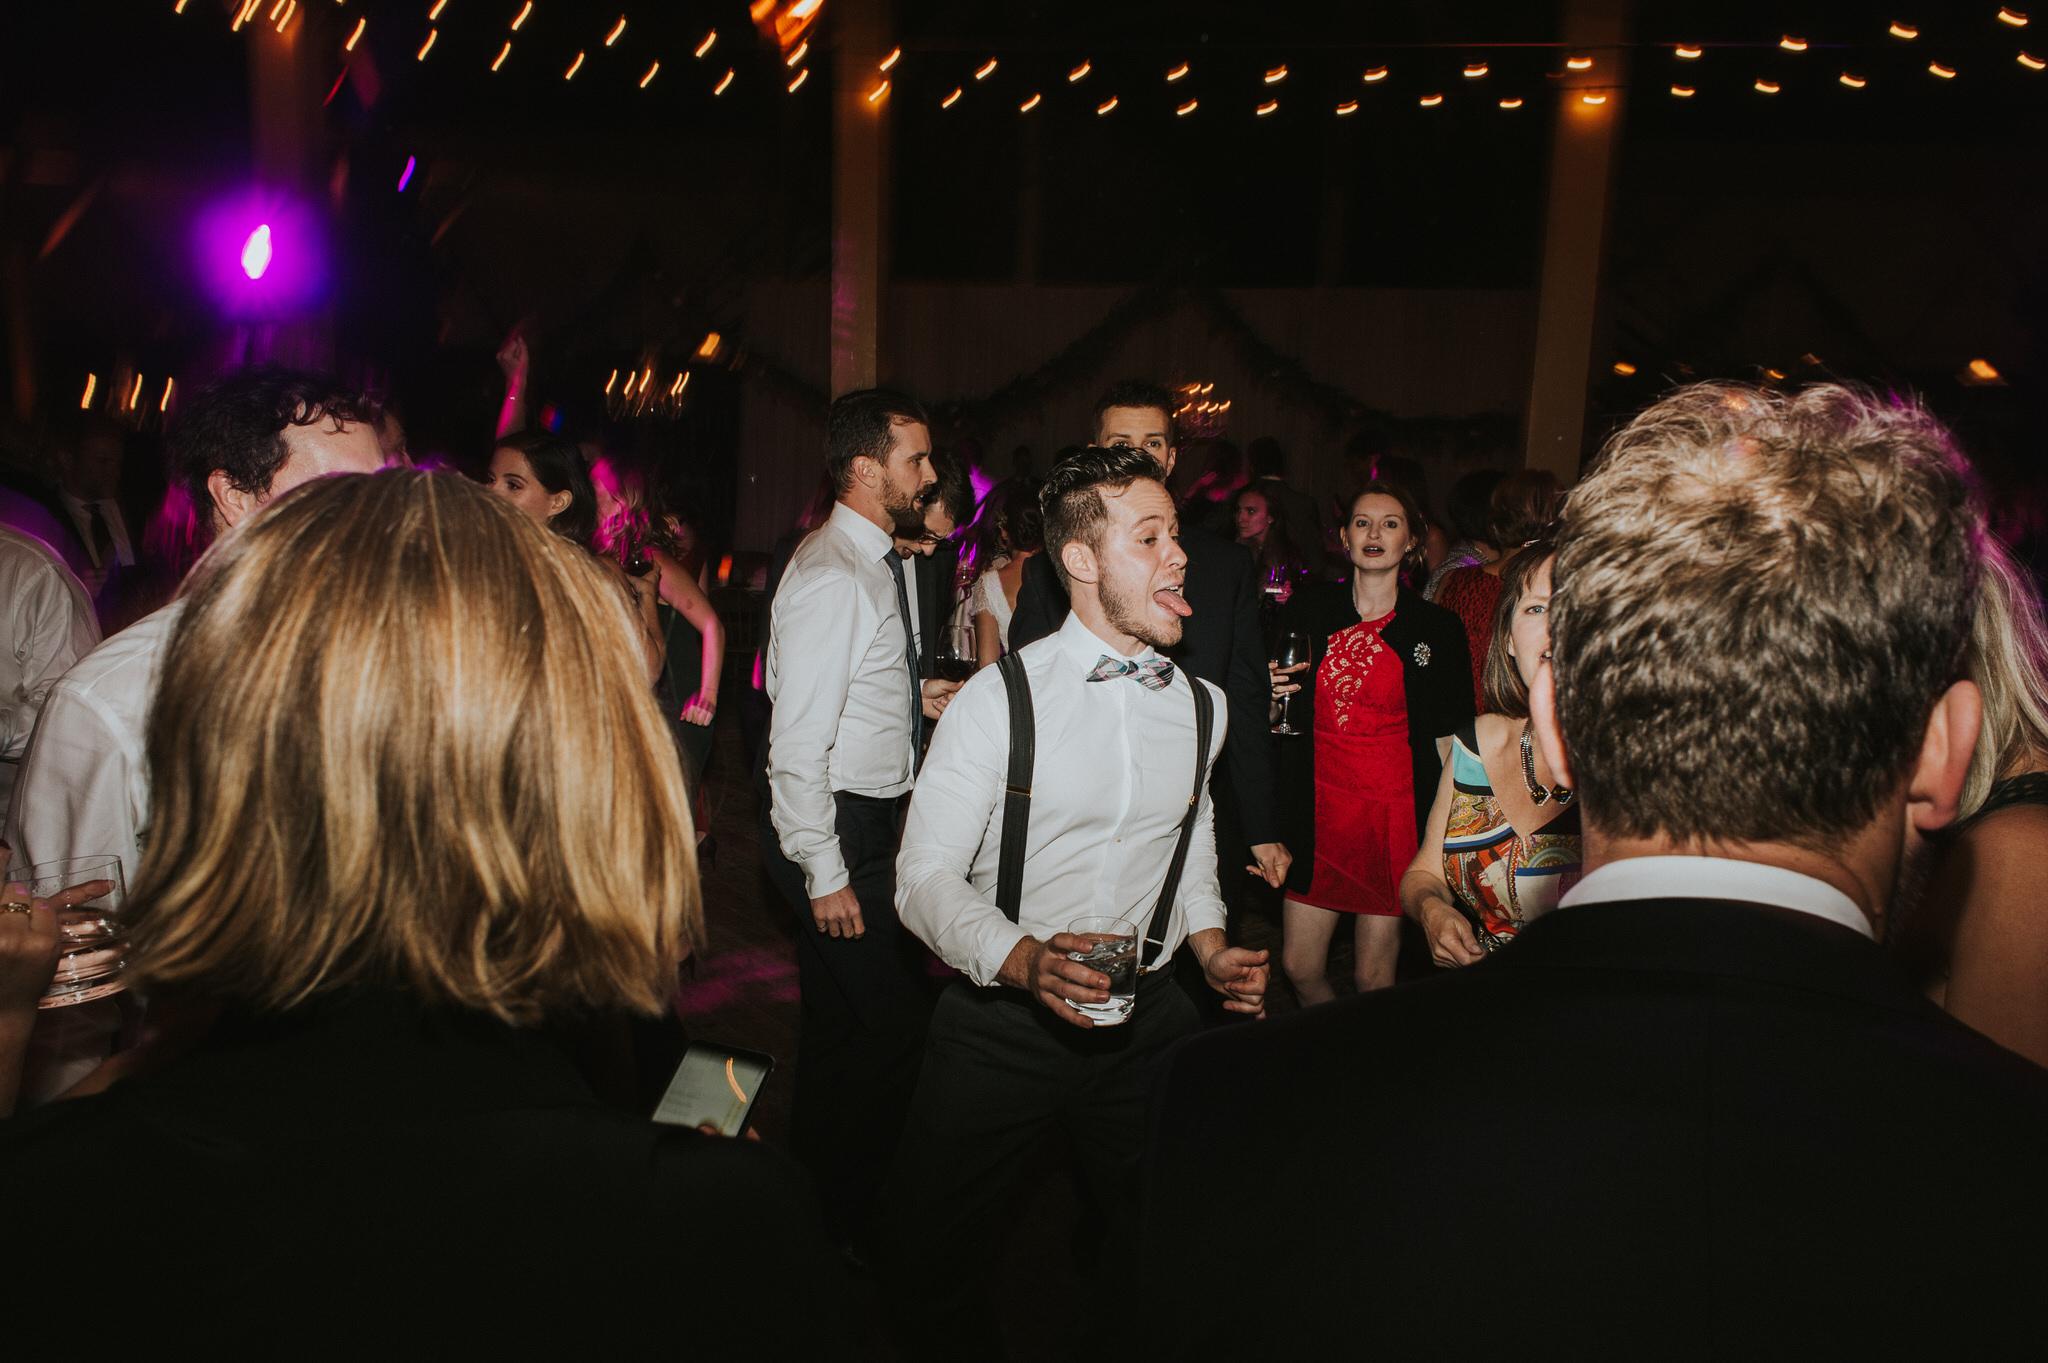 scarletoneillphotography_weddingphotography_prince edward county weddings206.JPG